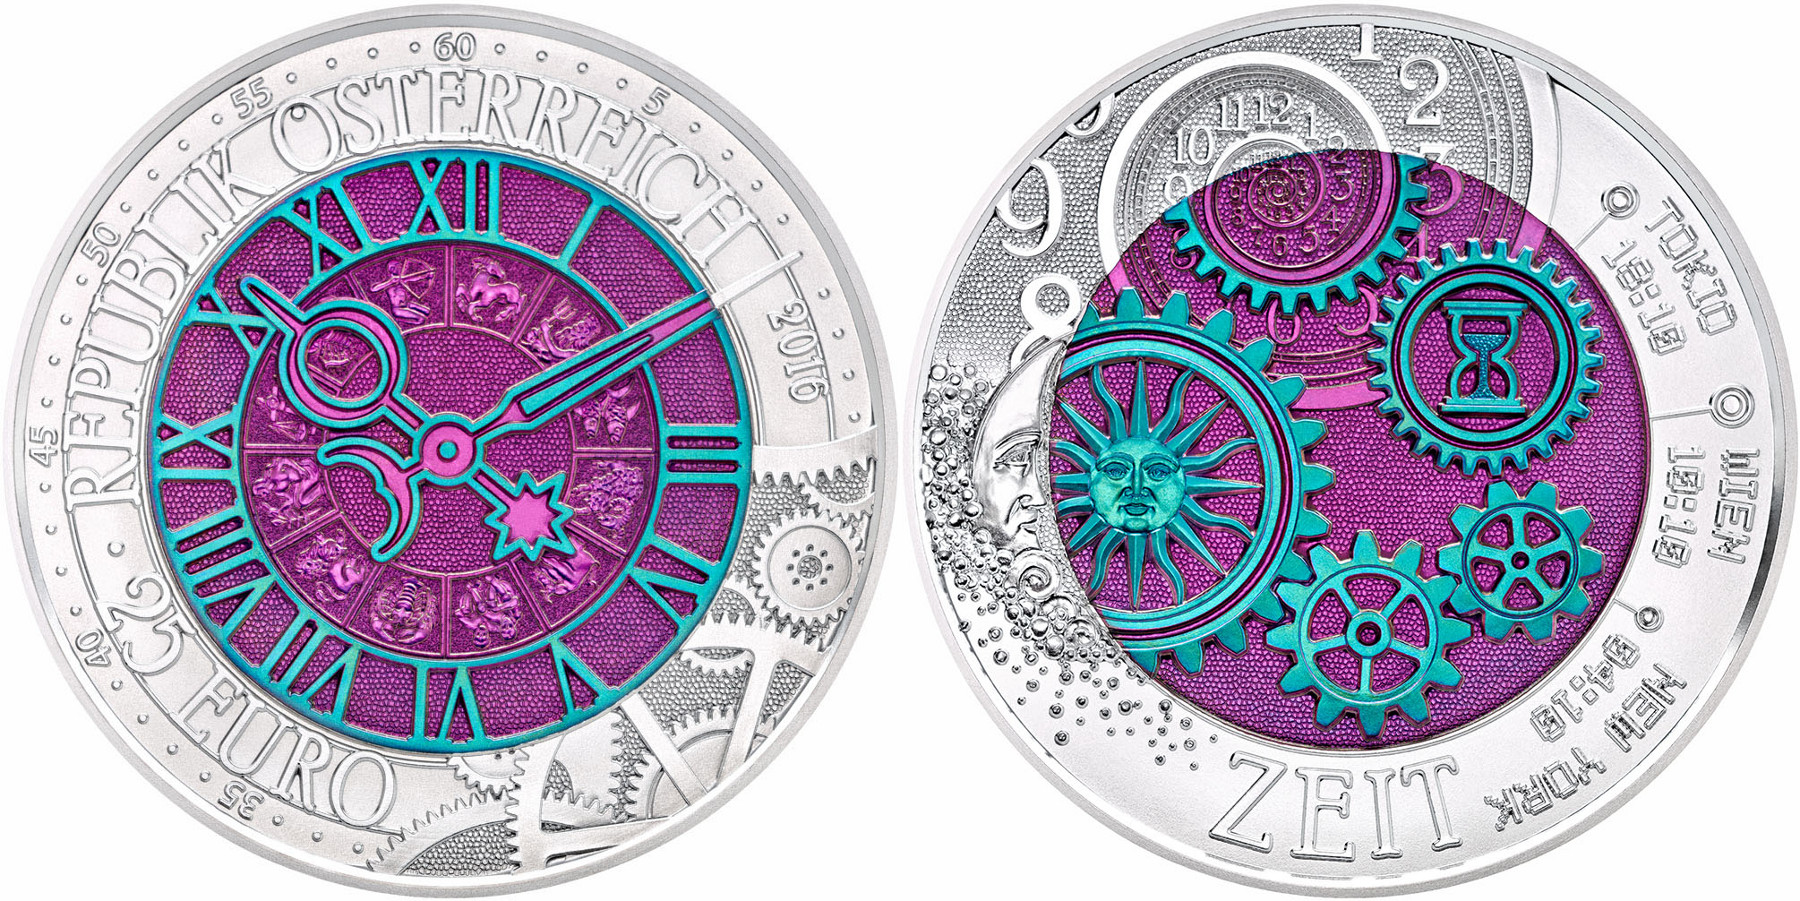 http://i2.wp.com/www.numismatica-visual.es/wp-content/uploads/2015/11/ni1.jpg